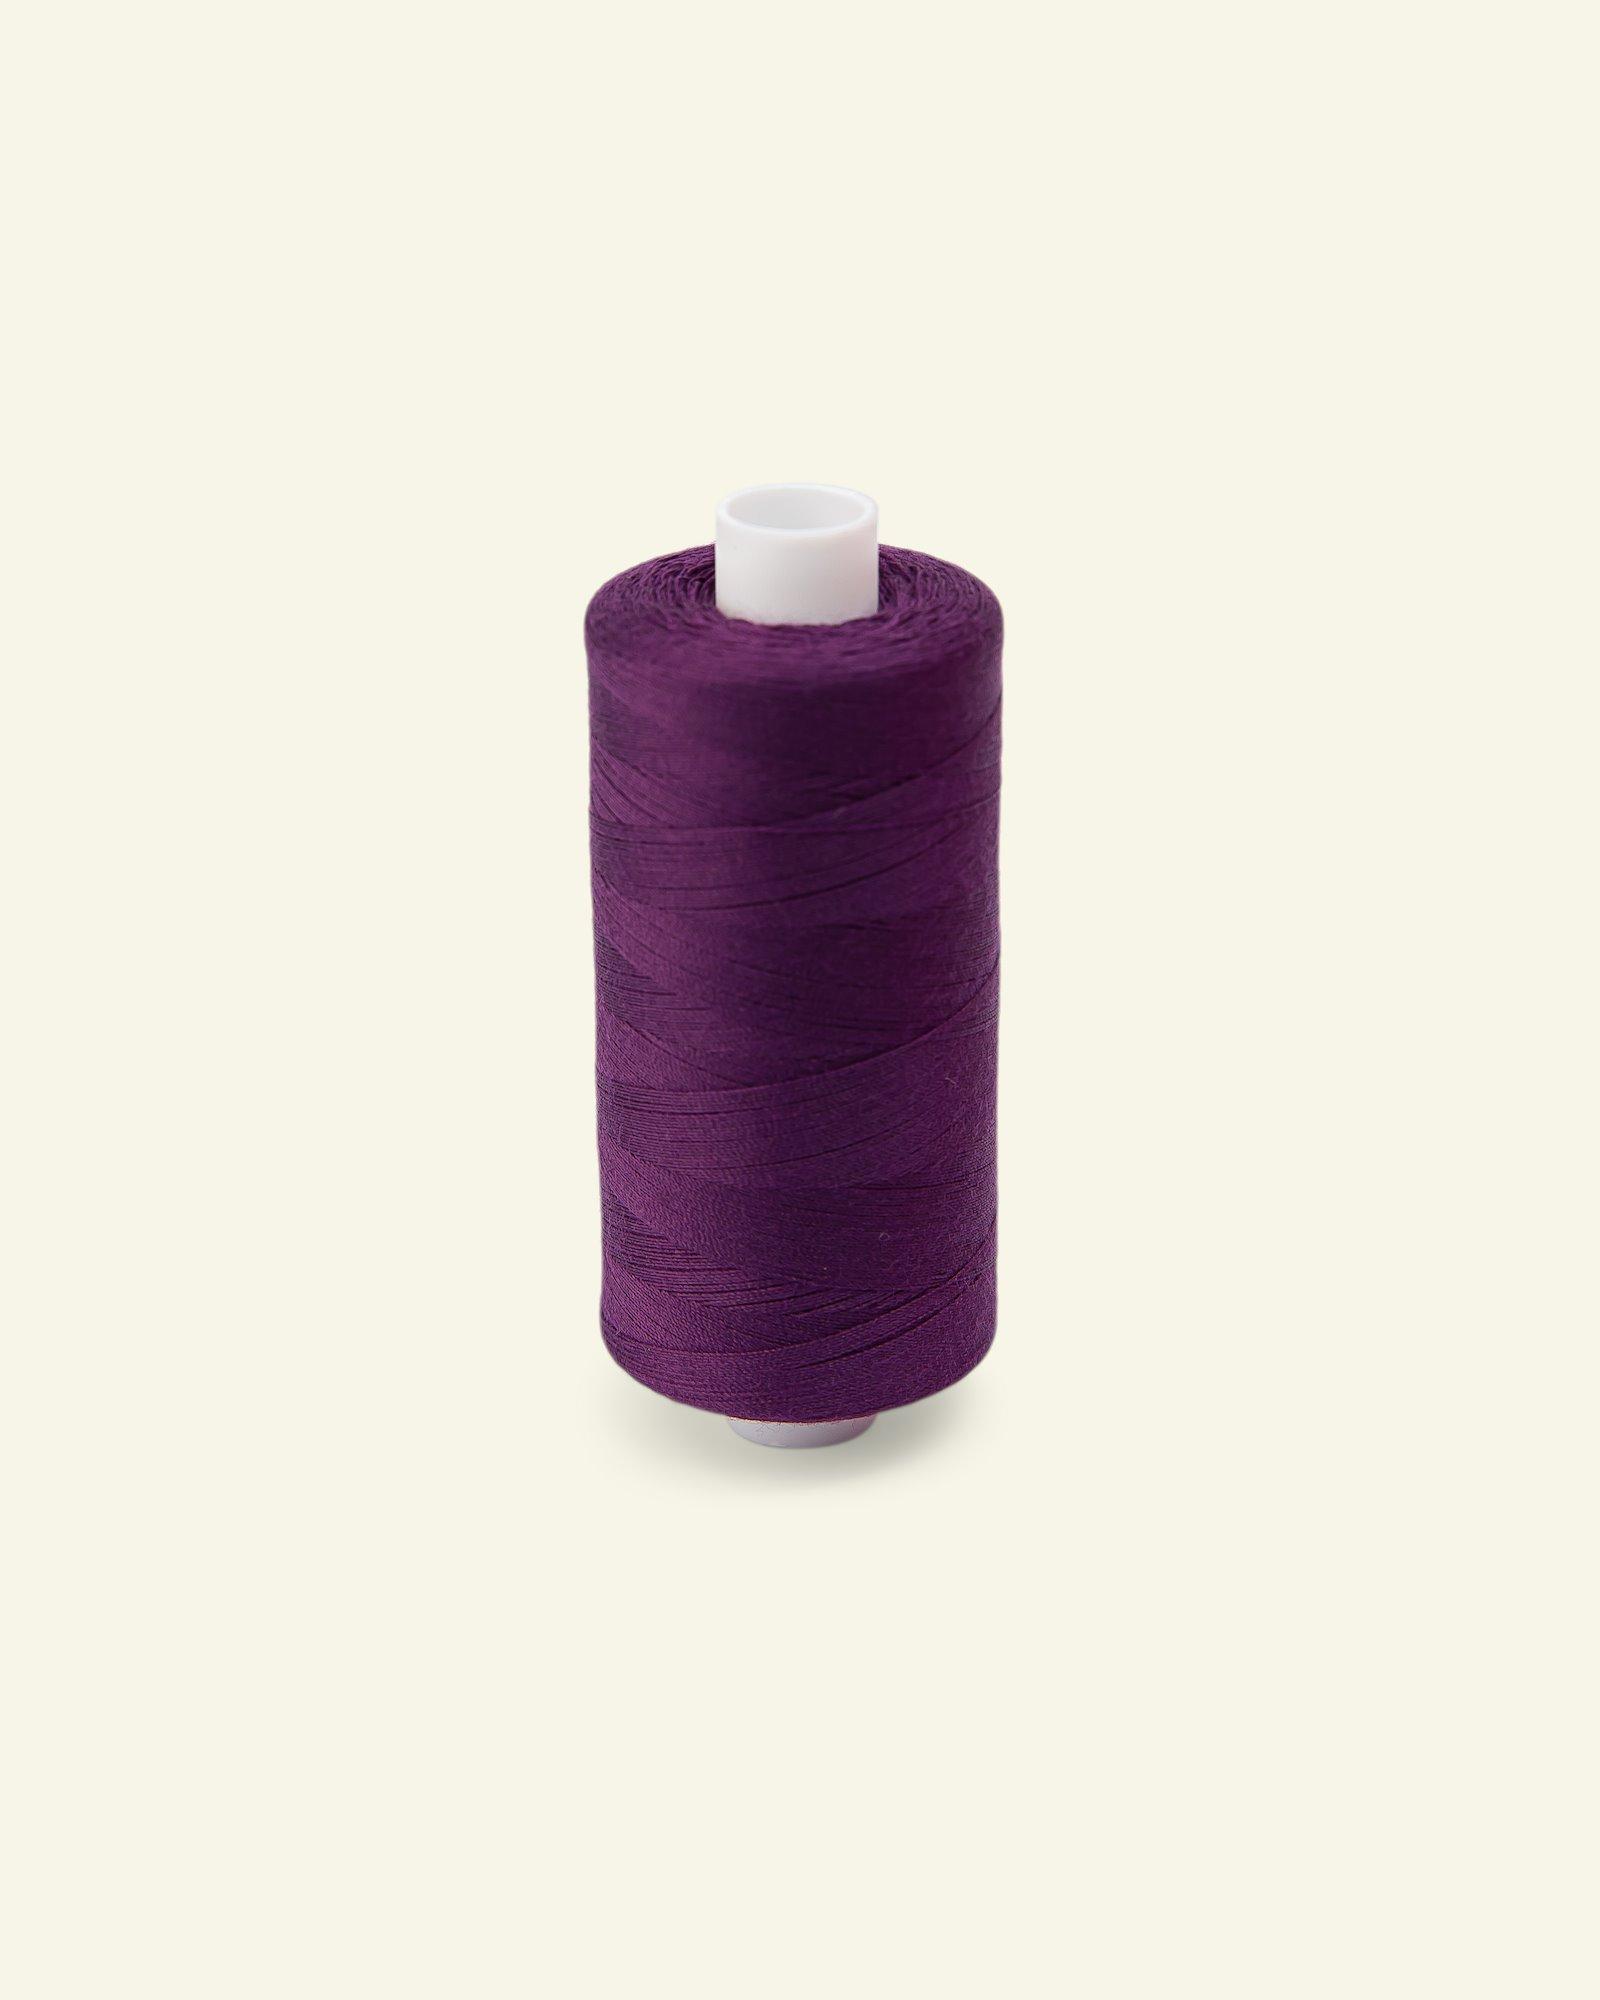 Sewing thread light aubergine 1000m